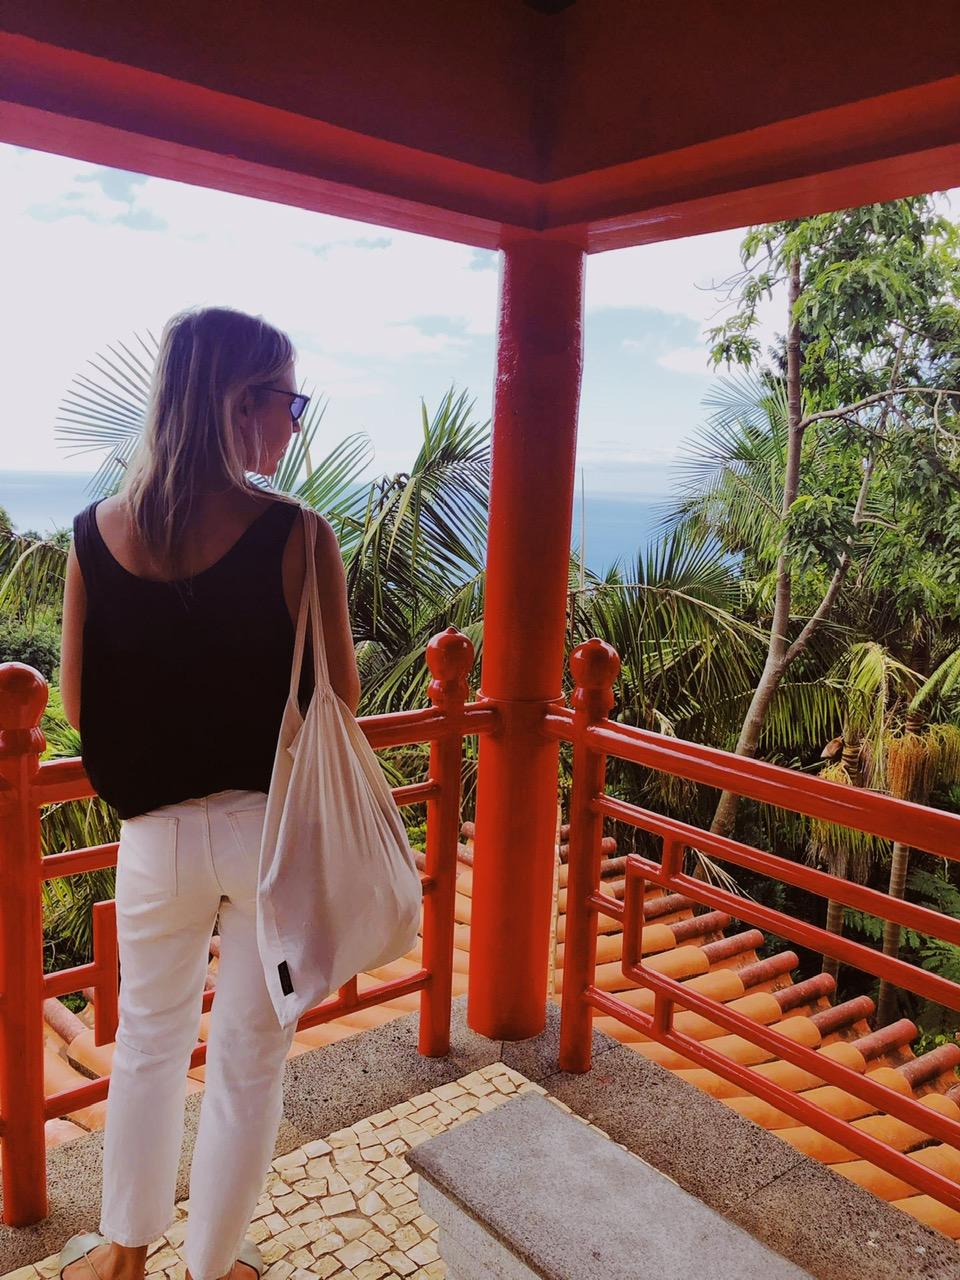 Hortonomin paratiisi Madeiralla